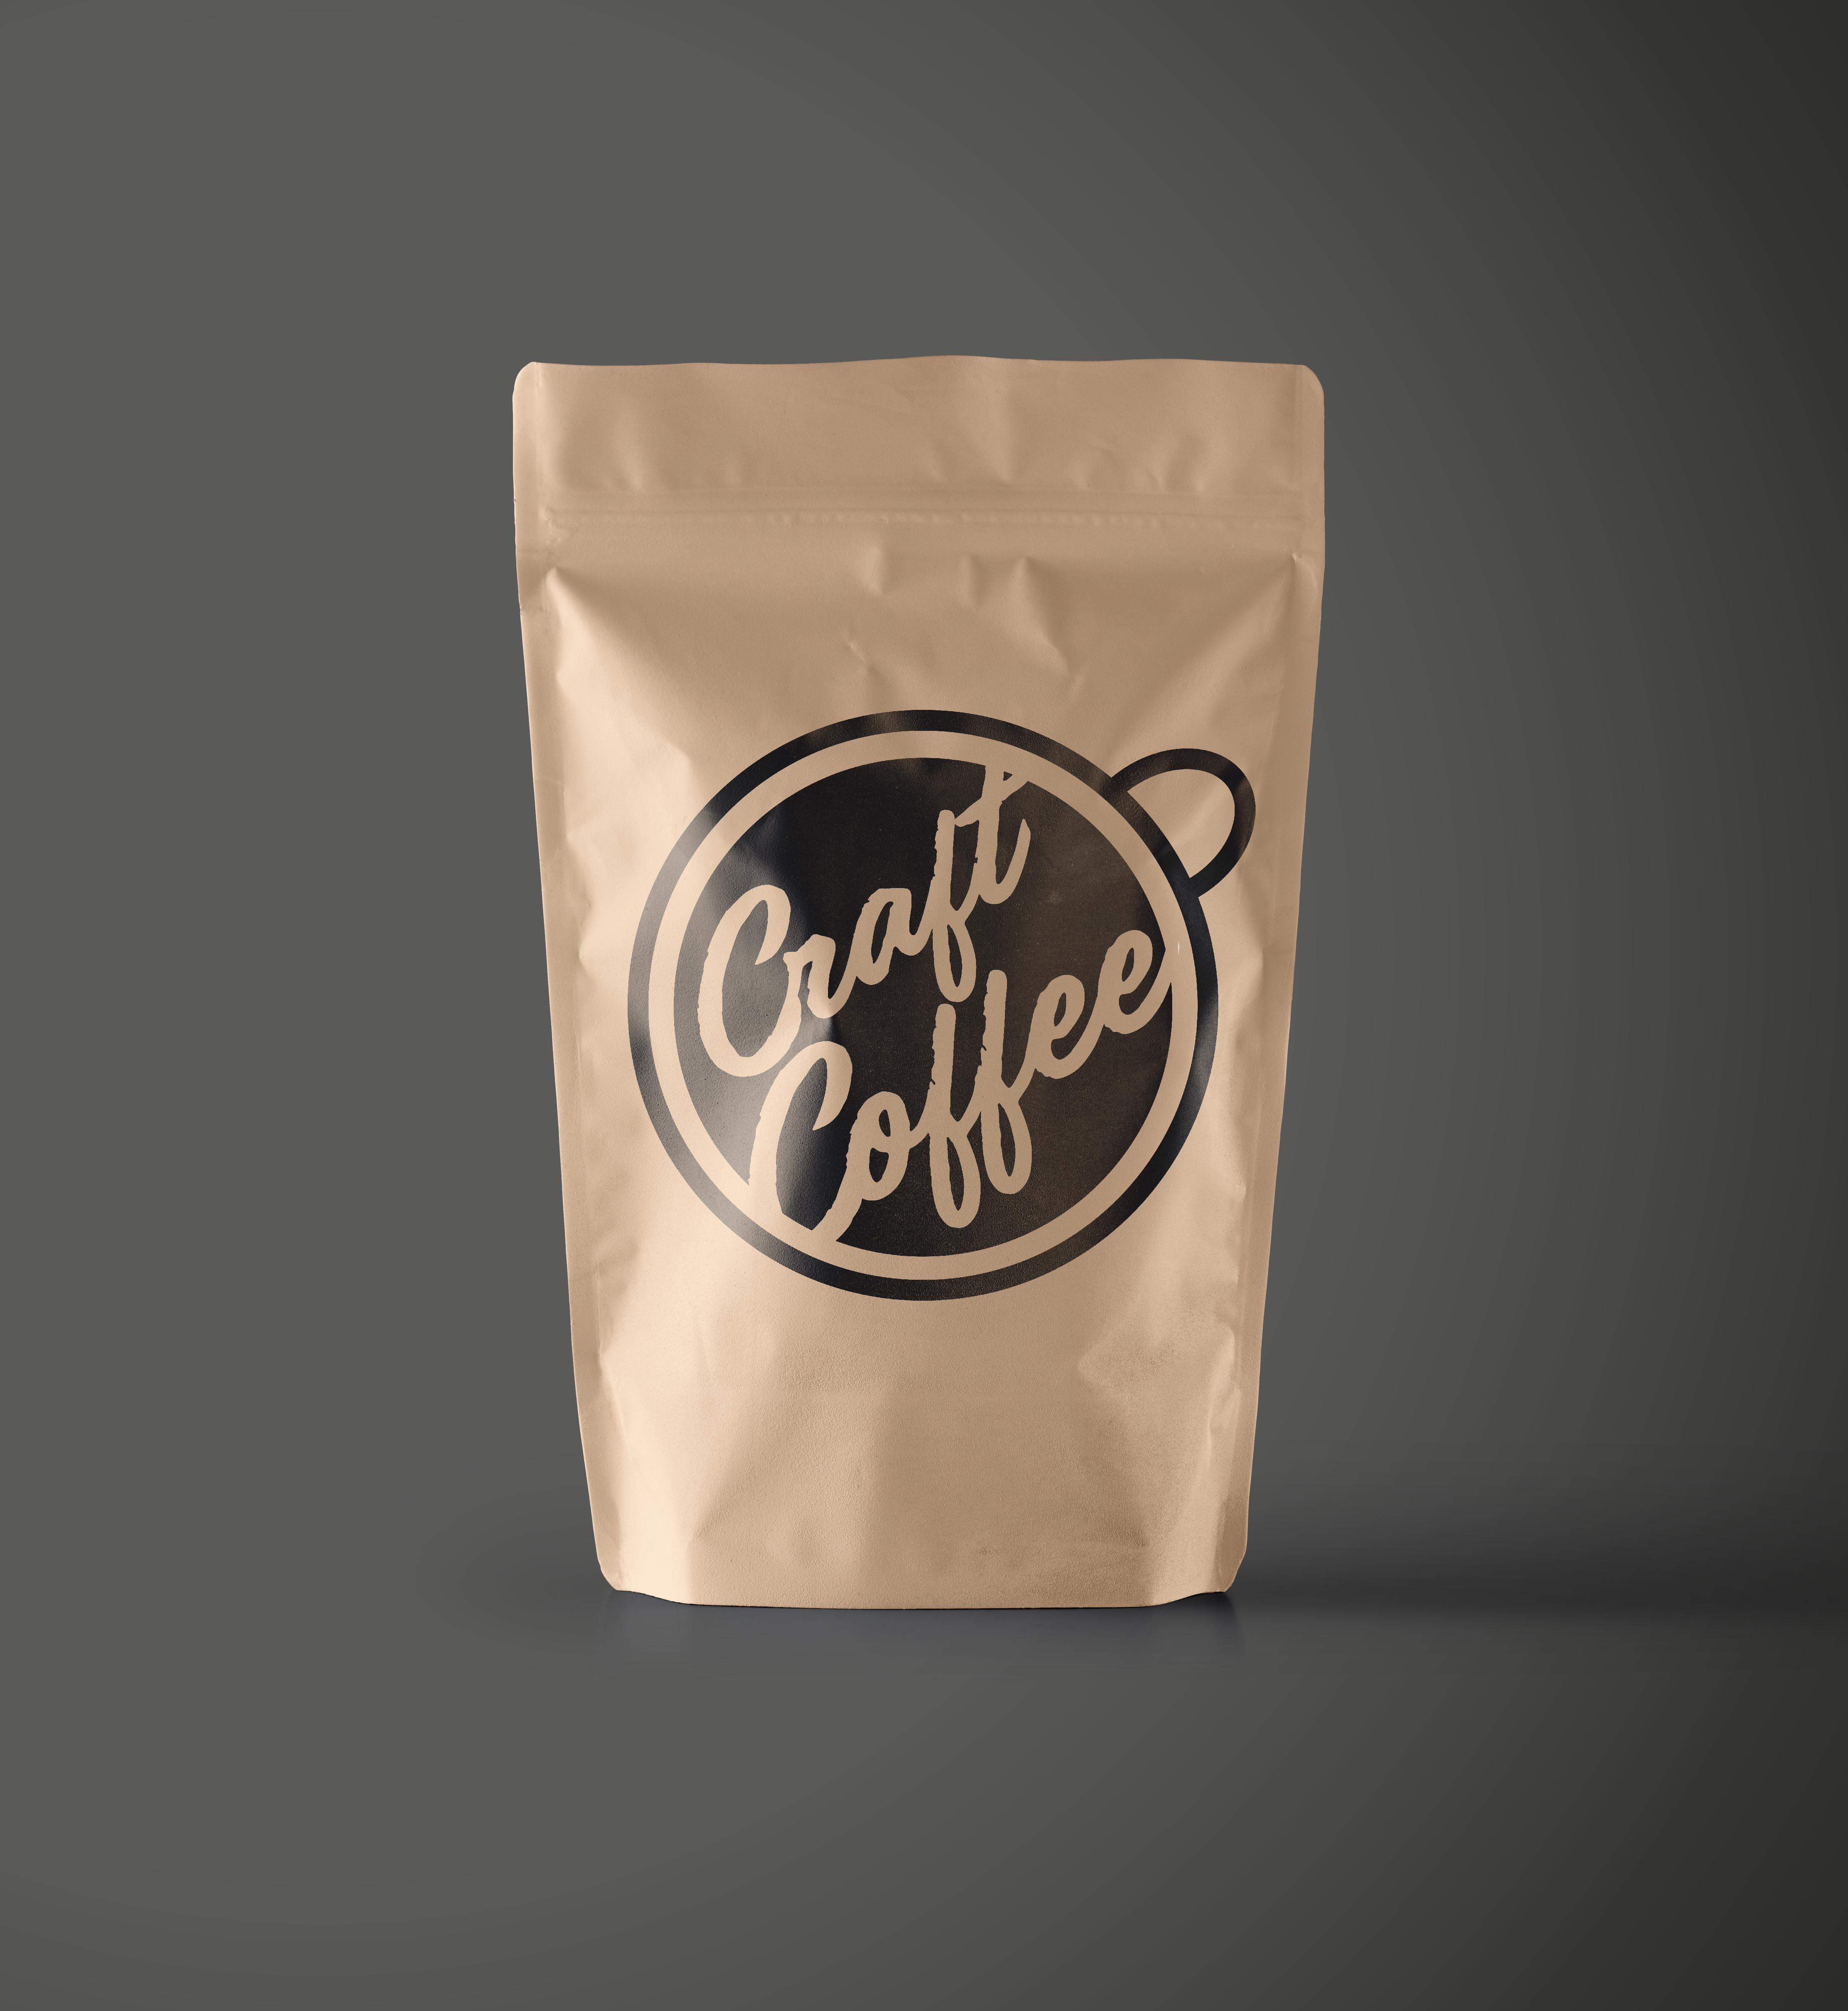 Логотип и фирменный стиль для компании COFFEE CULT фото f_6225bbc849e62a02.jpg